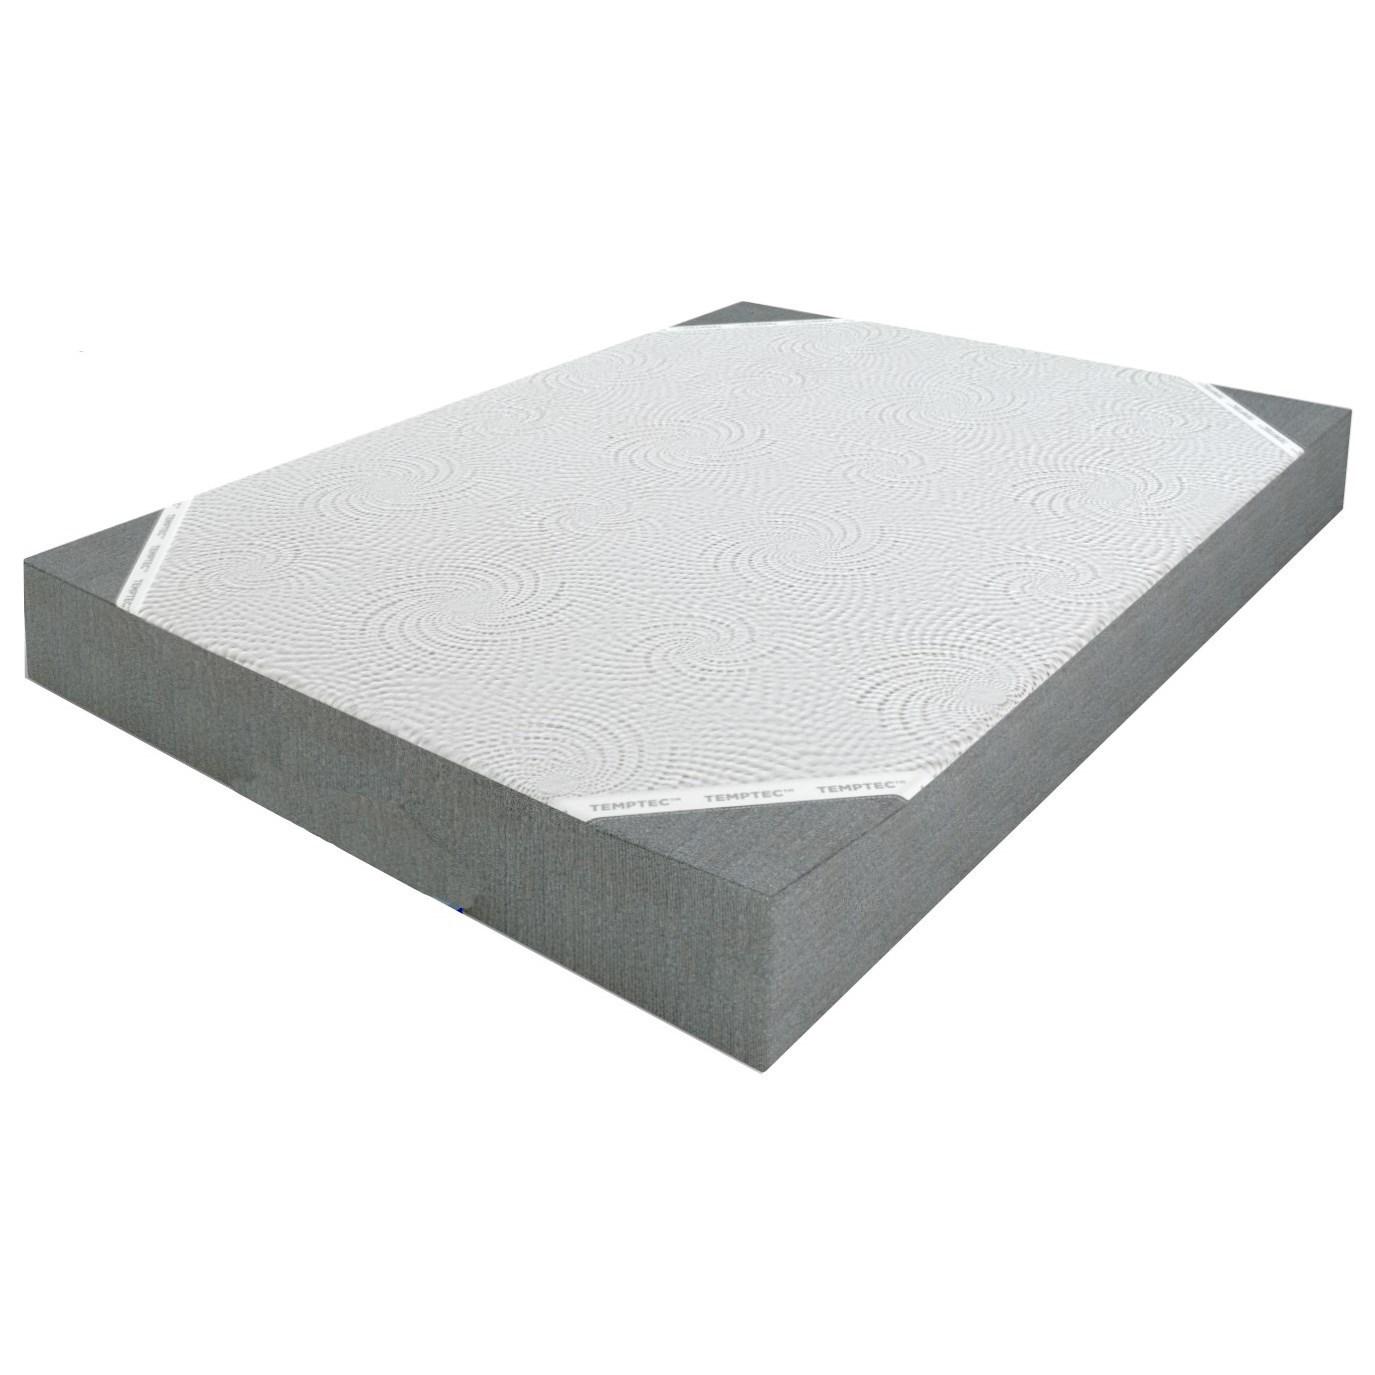 "Tranquil 8 Full 8"" Memory Foam Mattress by Glideaway at Beds N Stuff"